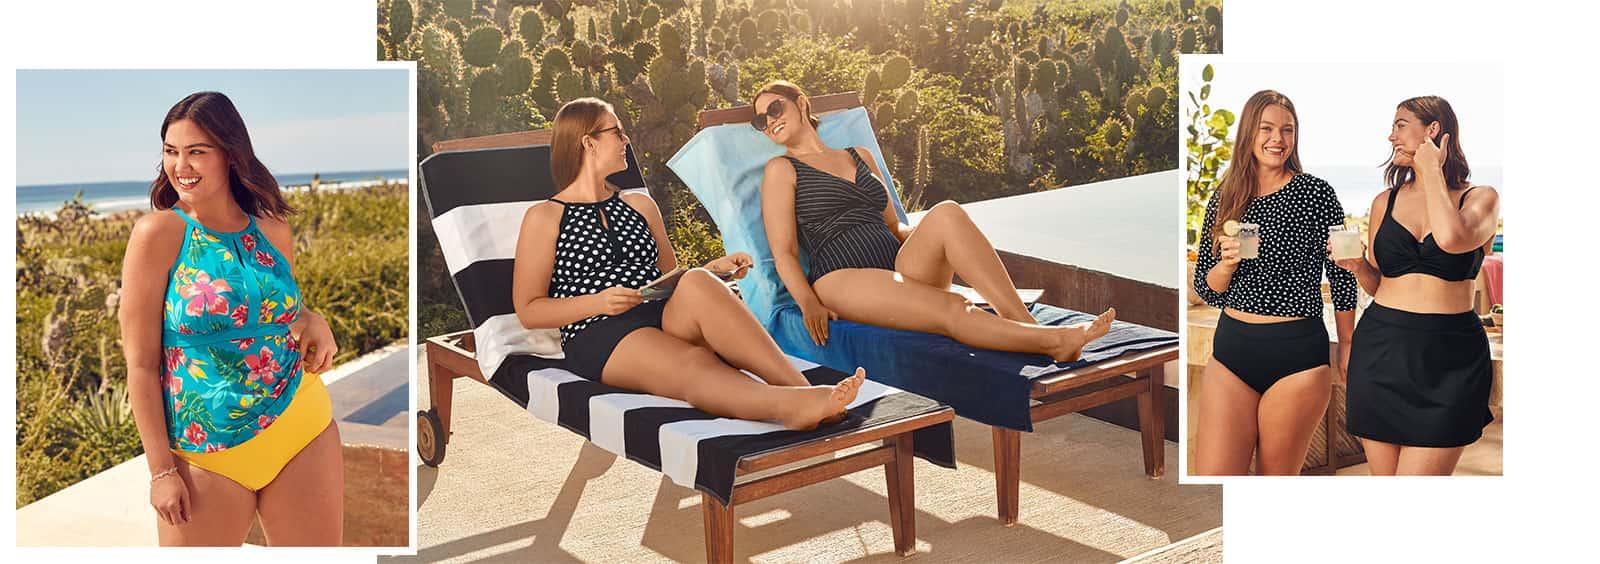 Celebrate Your Curves: Figure Flattering Swimwear for Plus Size Women